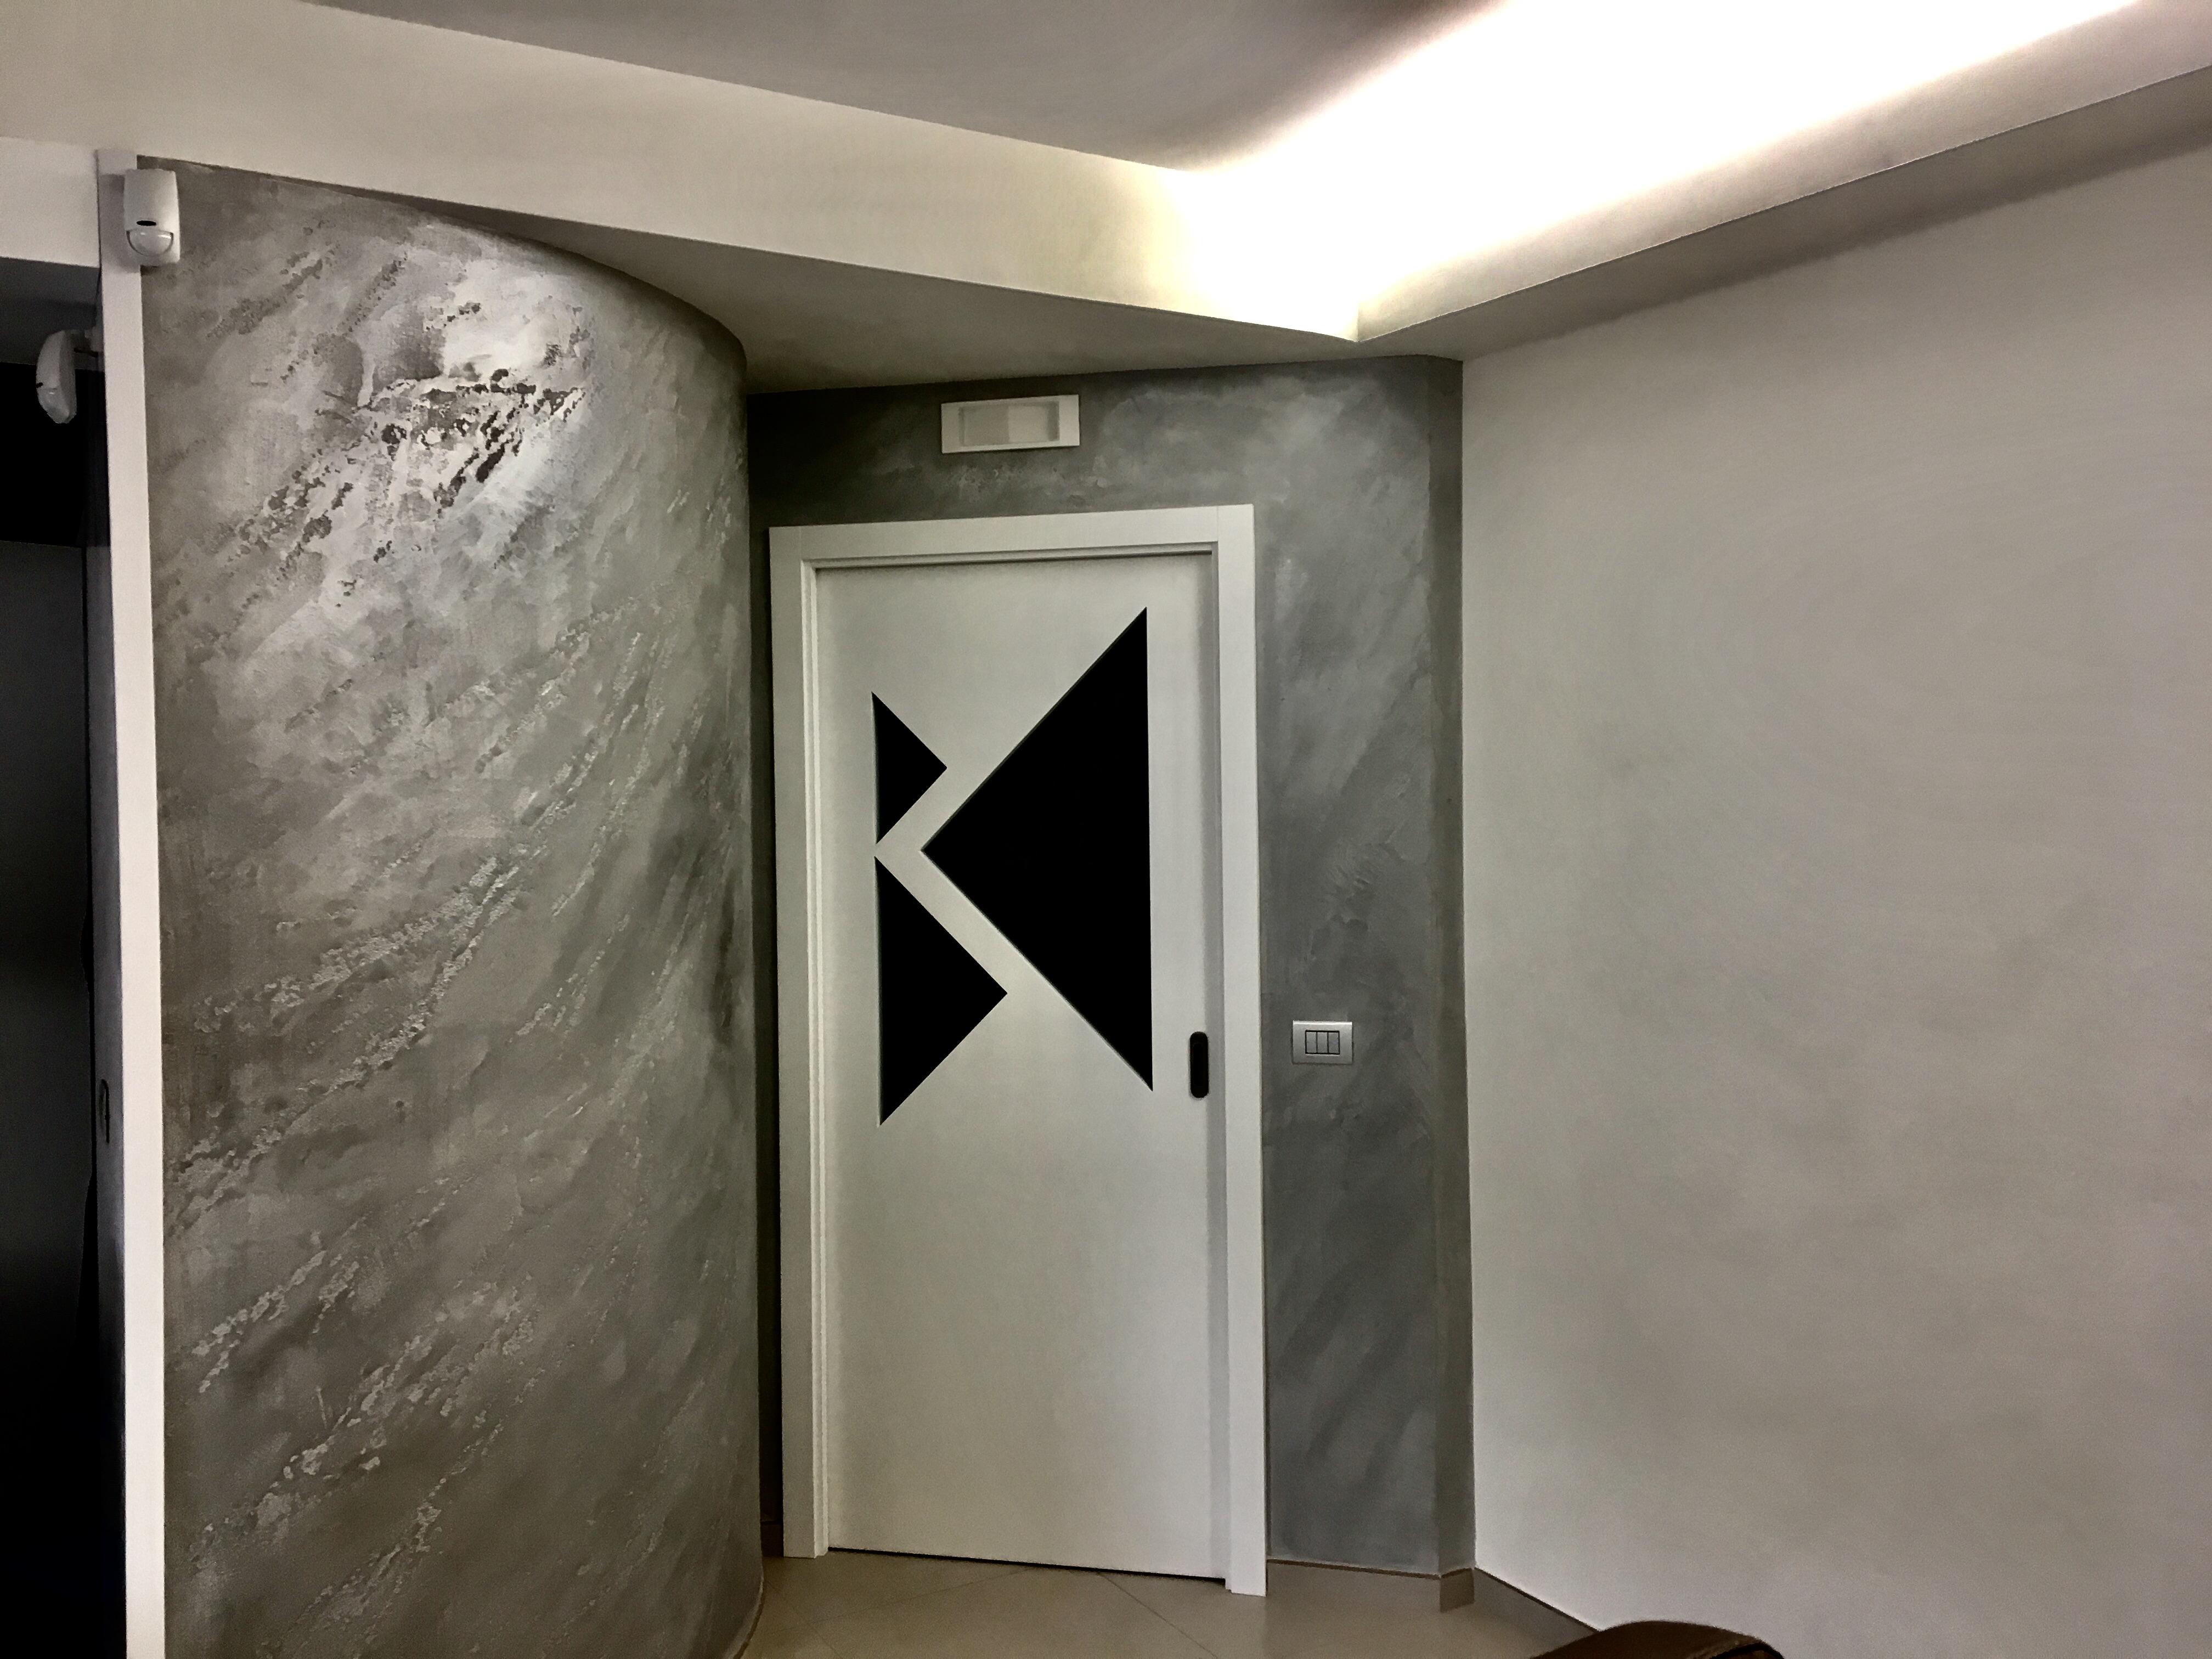 Home Decorarte Malerbetrieb Spachteltechnik Wuppertal